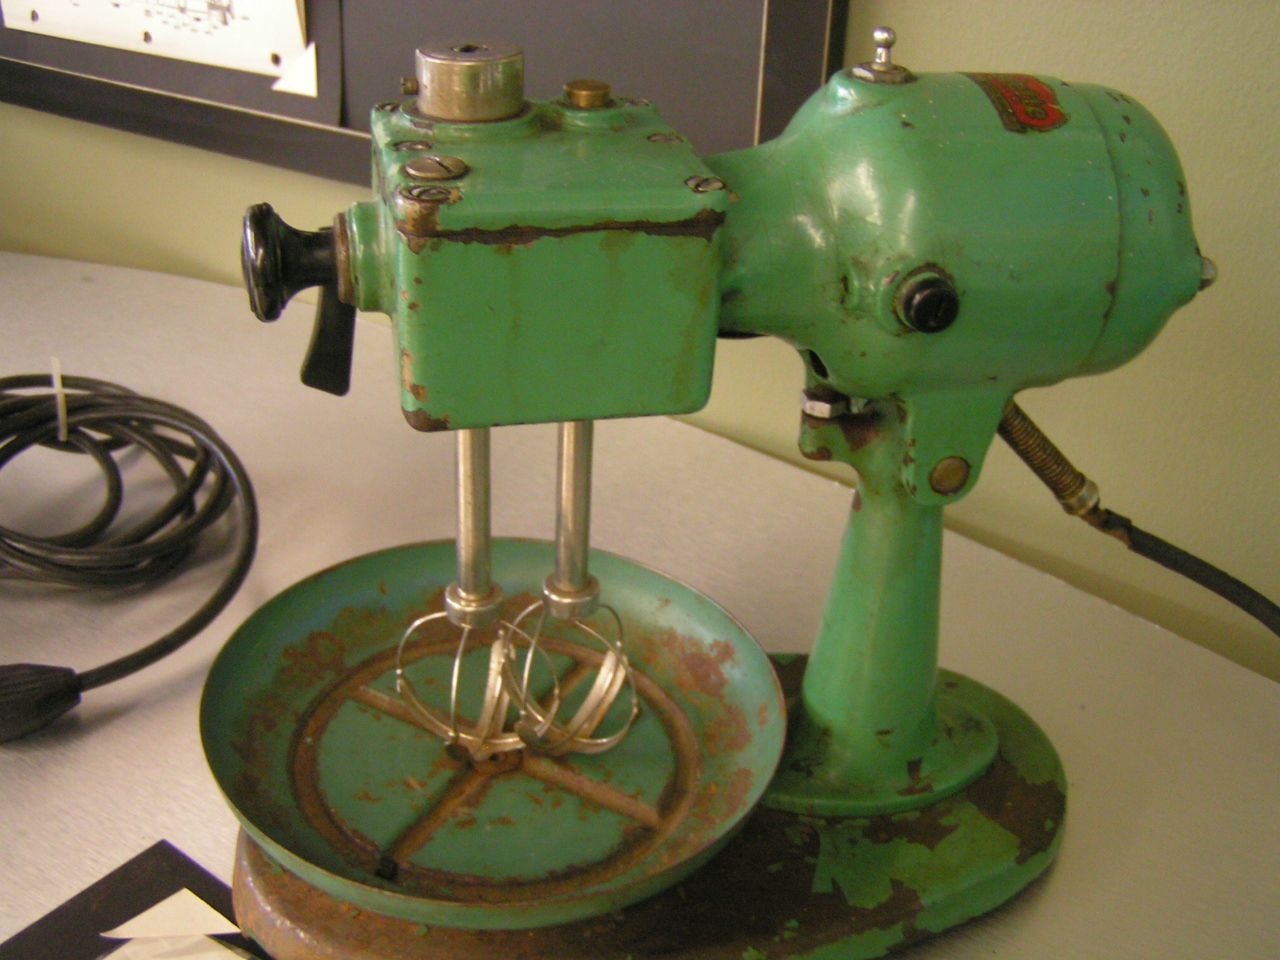 Kitchenaid hand mixer parts photo - 2